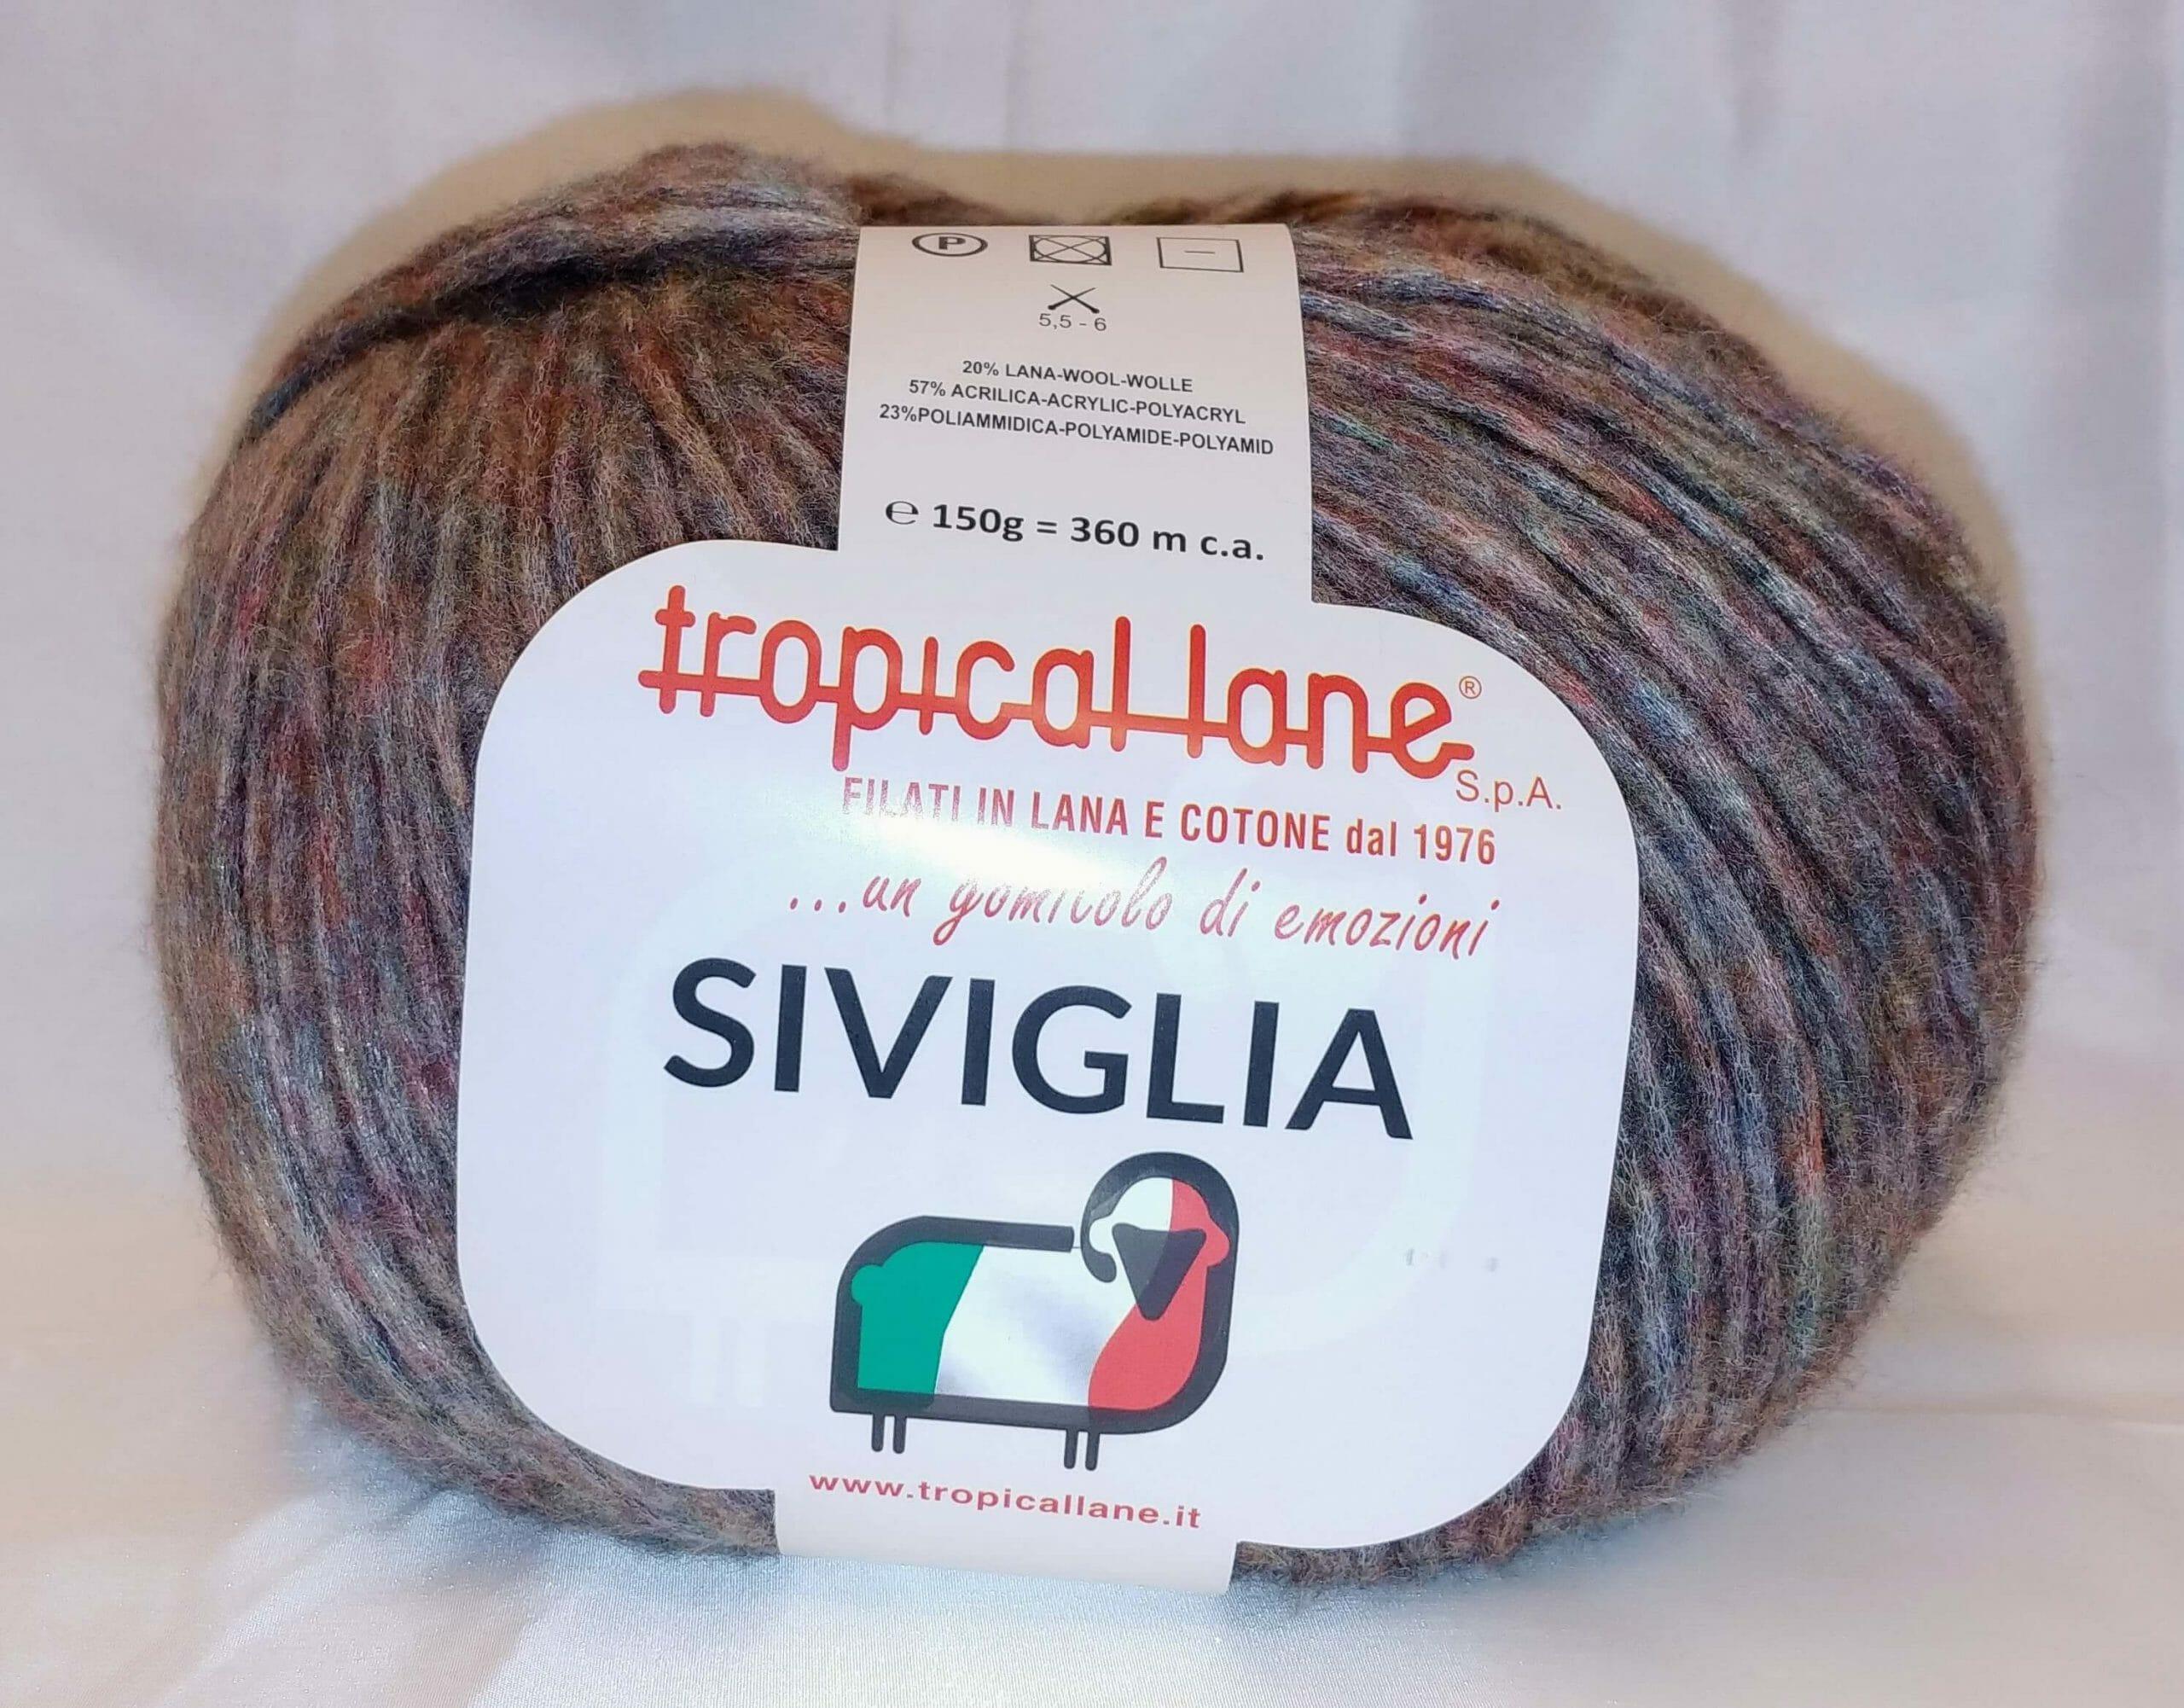 Tropical Lane - Siviglia